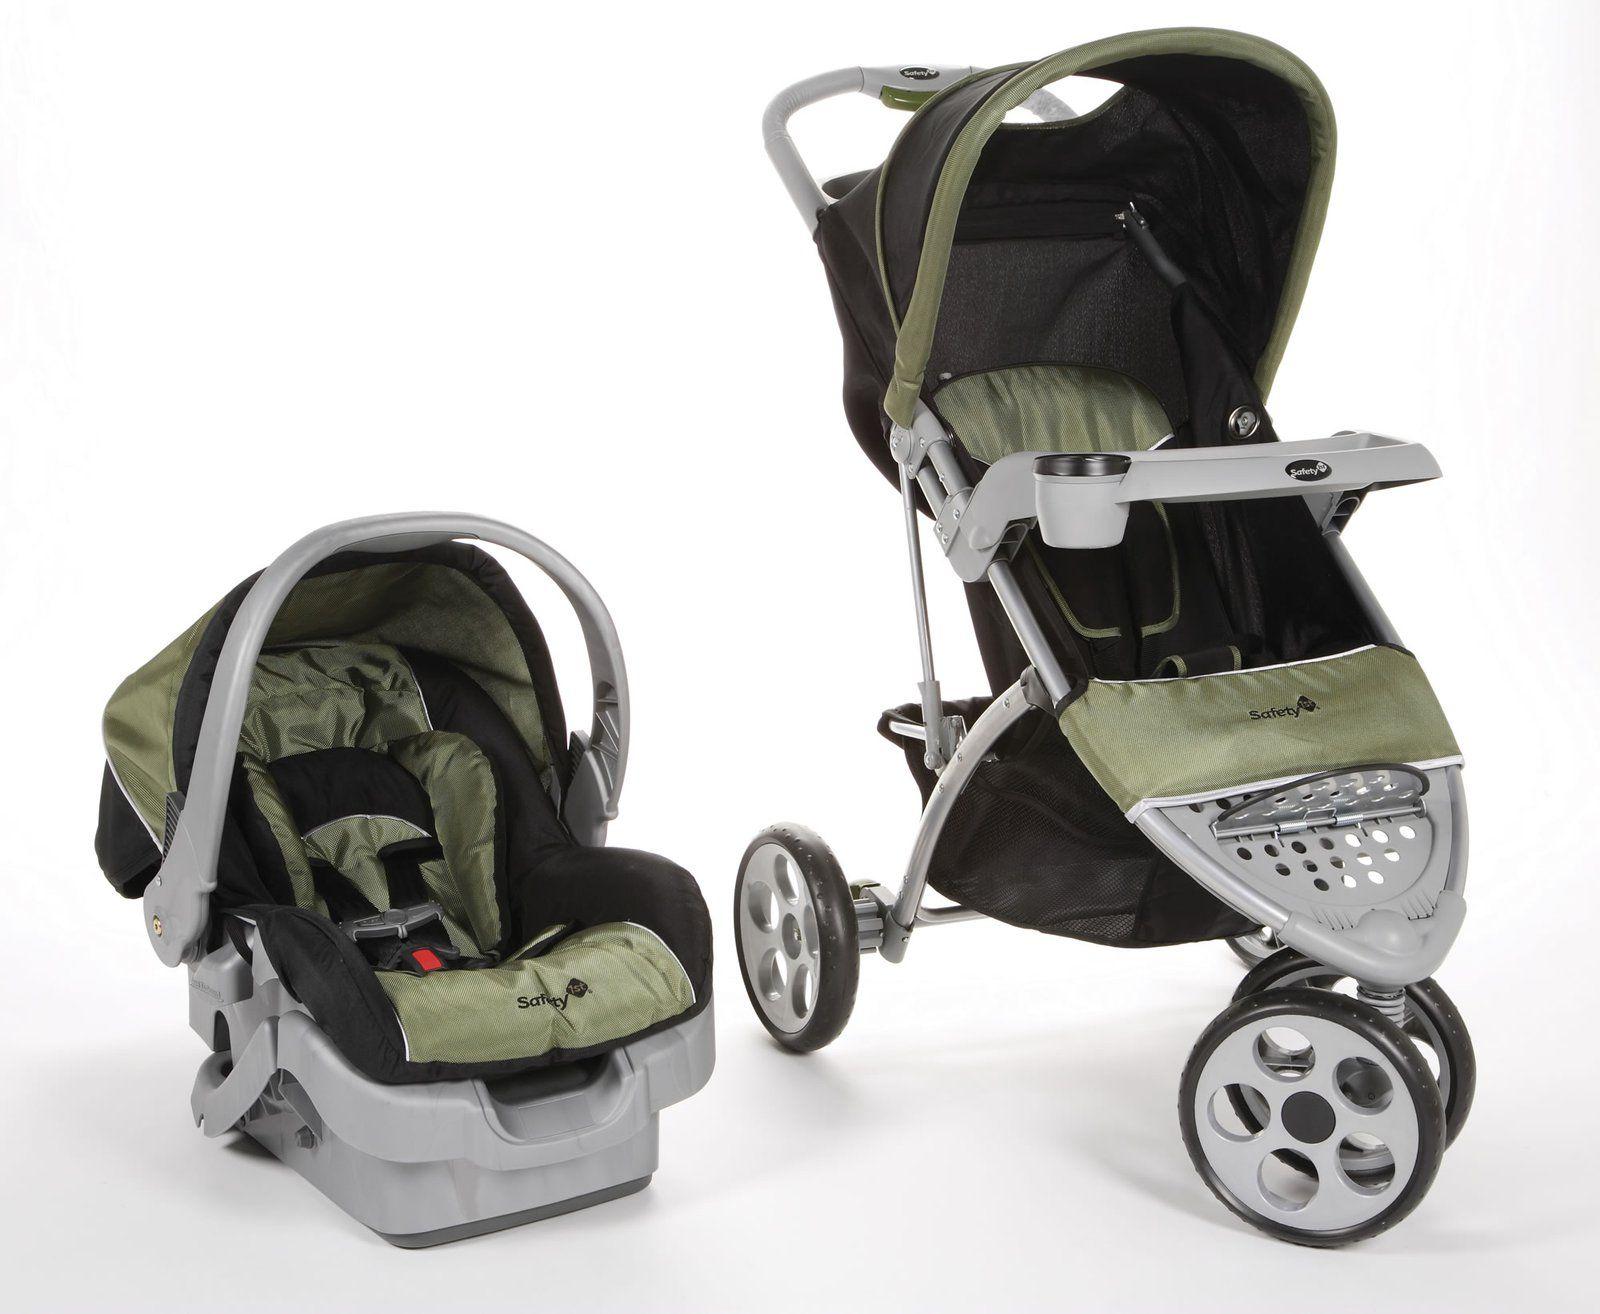 car seat/stroller Travel system, Car seat stroller